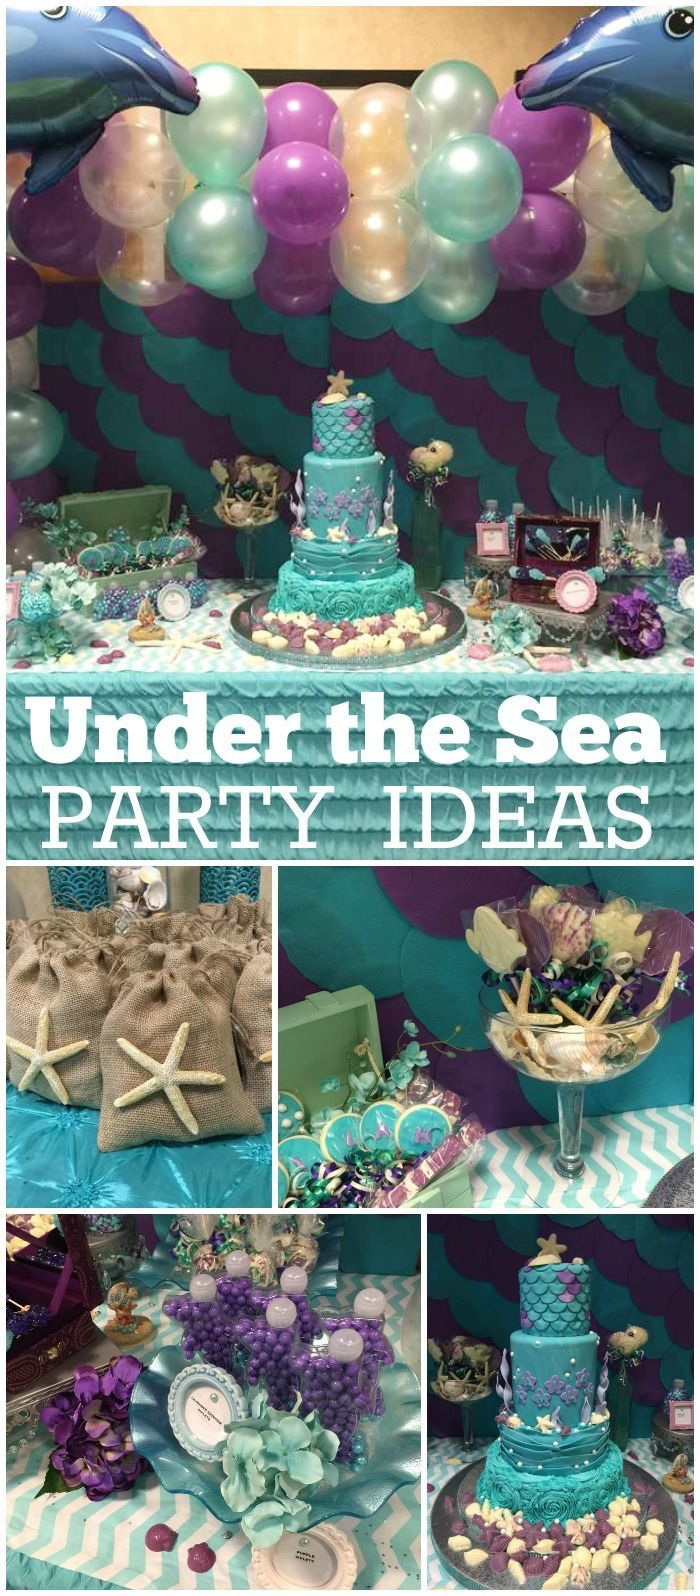 671180c66225a35ac7ed3e31aacf4f26 Jpg 700 1596 Sea Party Ideas